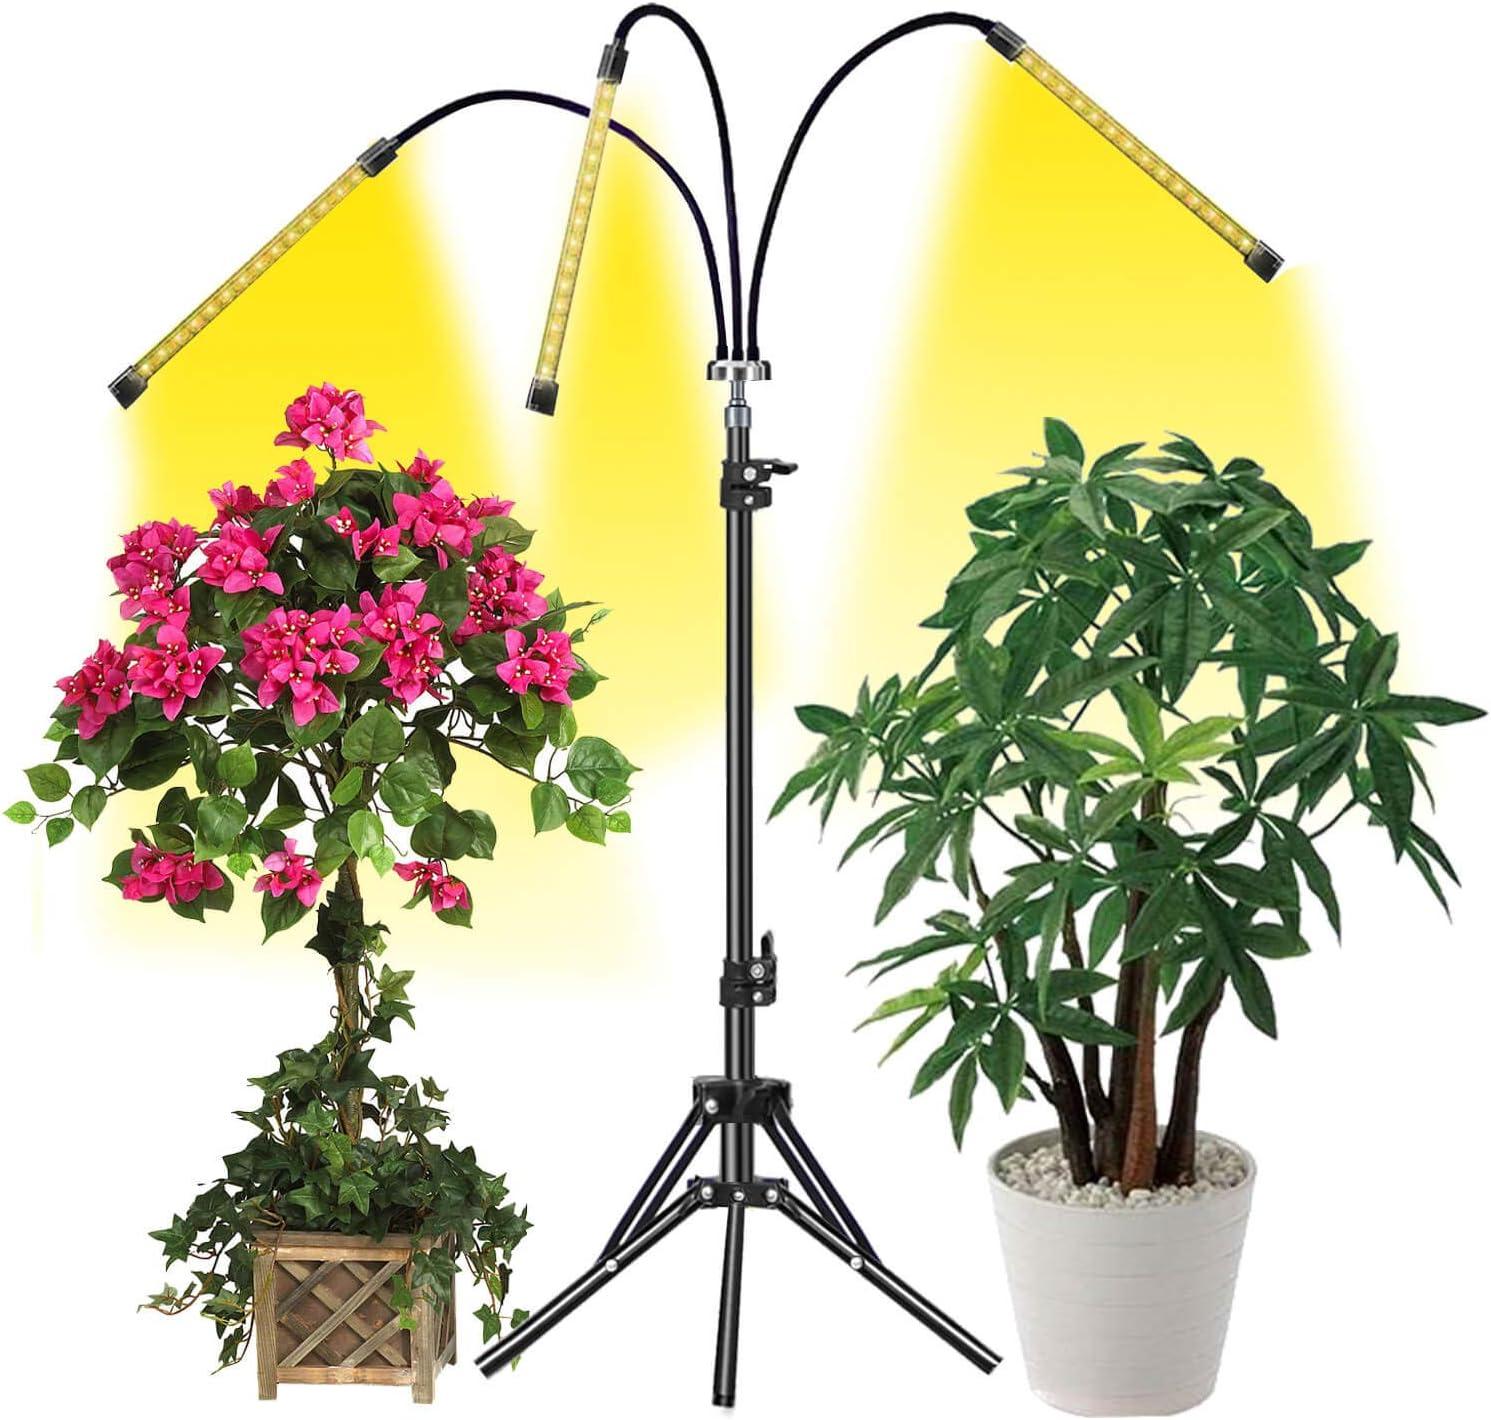 60W LED Grow Light Dual Head UV /& IR 360 Adjustable Plant Lamp For Indoor Plants